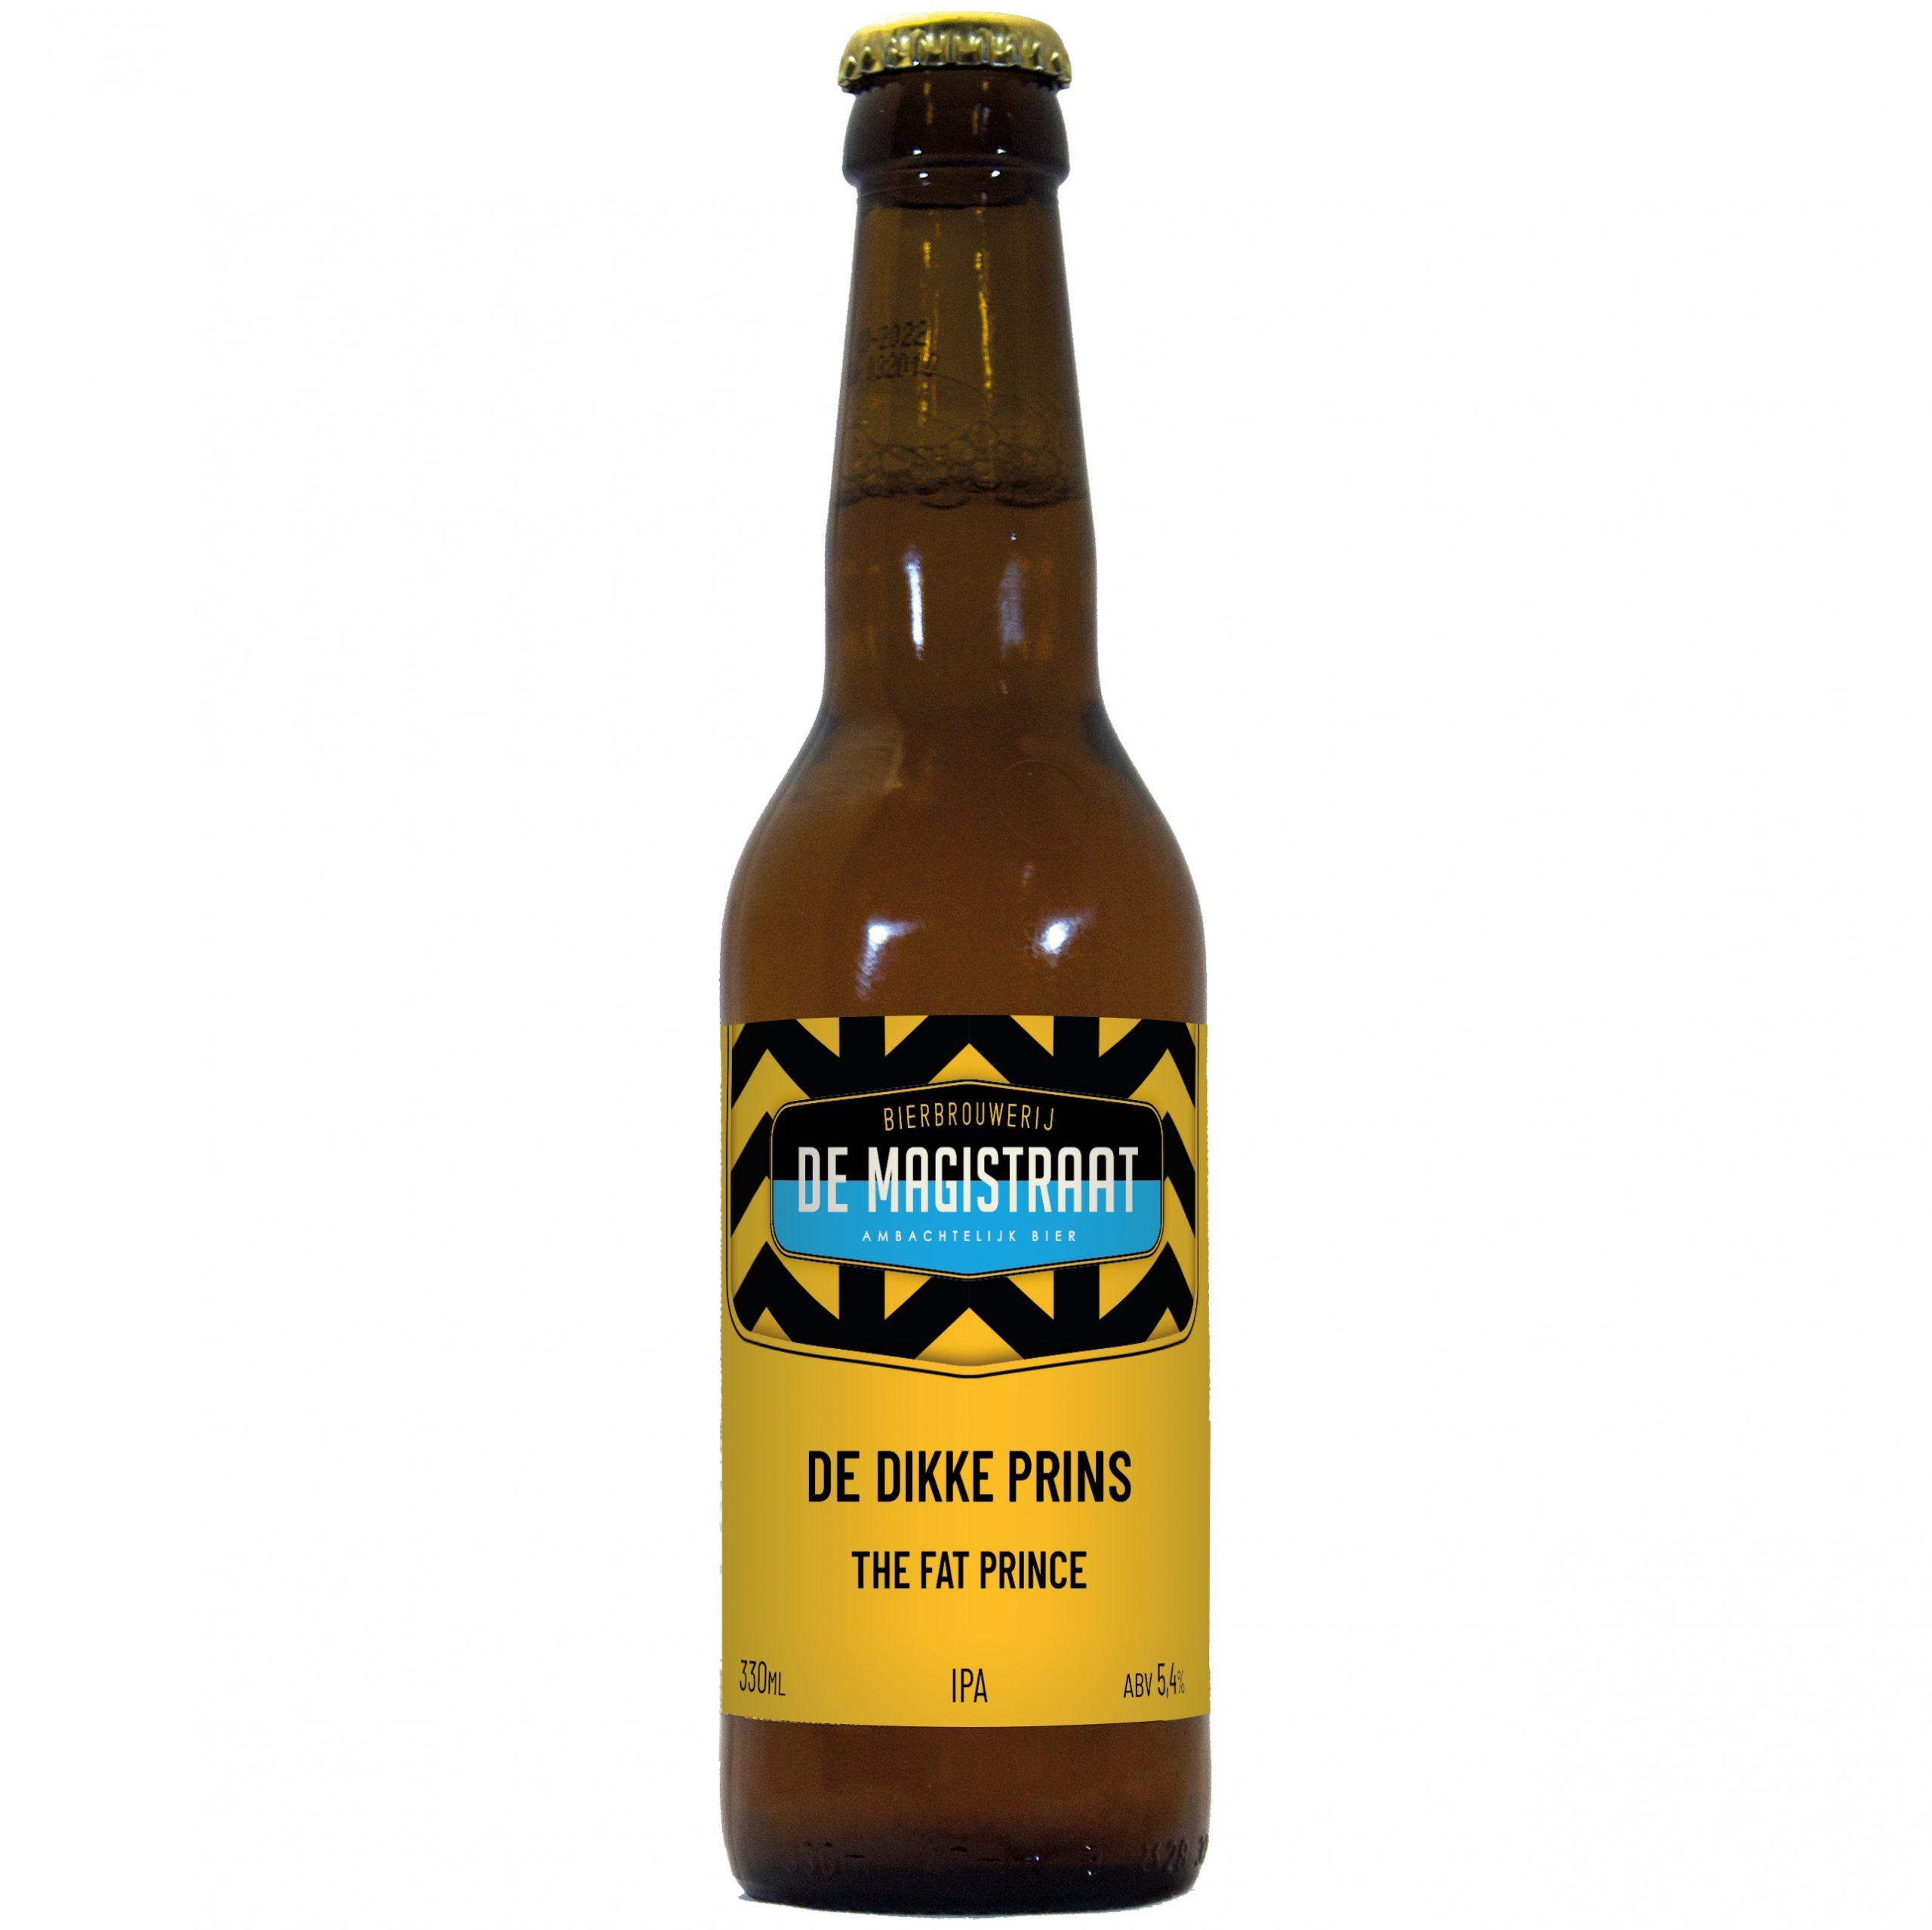 IPA bier 'De Dikke Prins' 5,5%